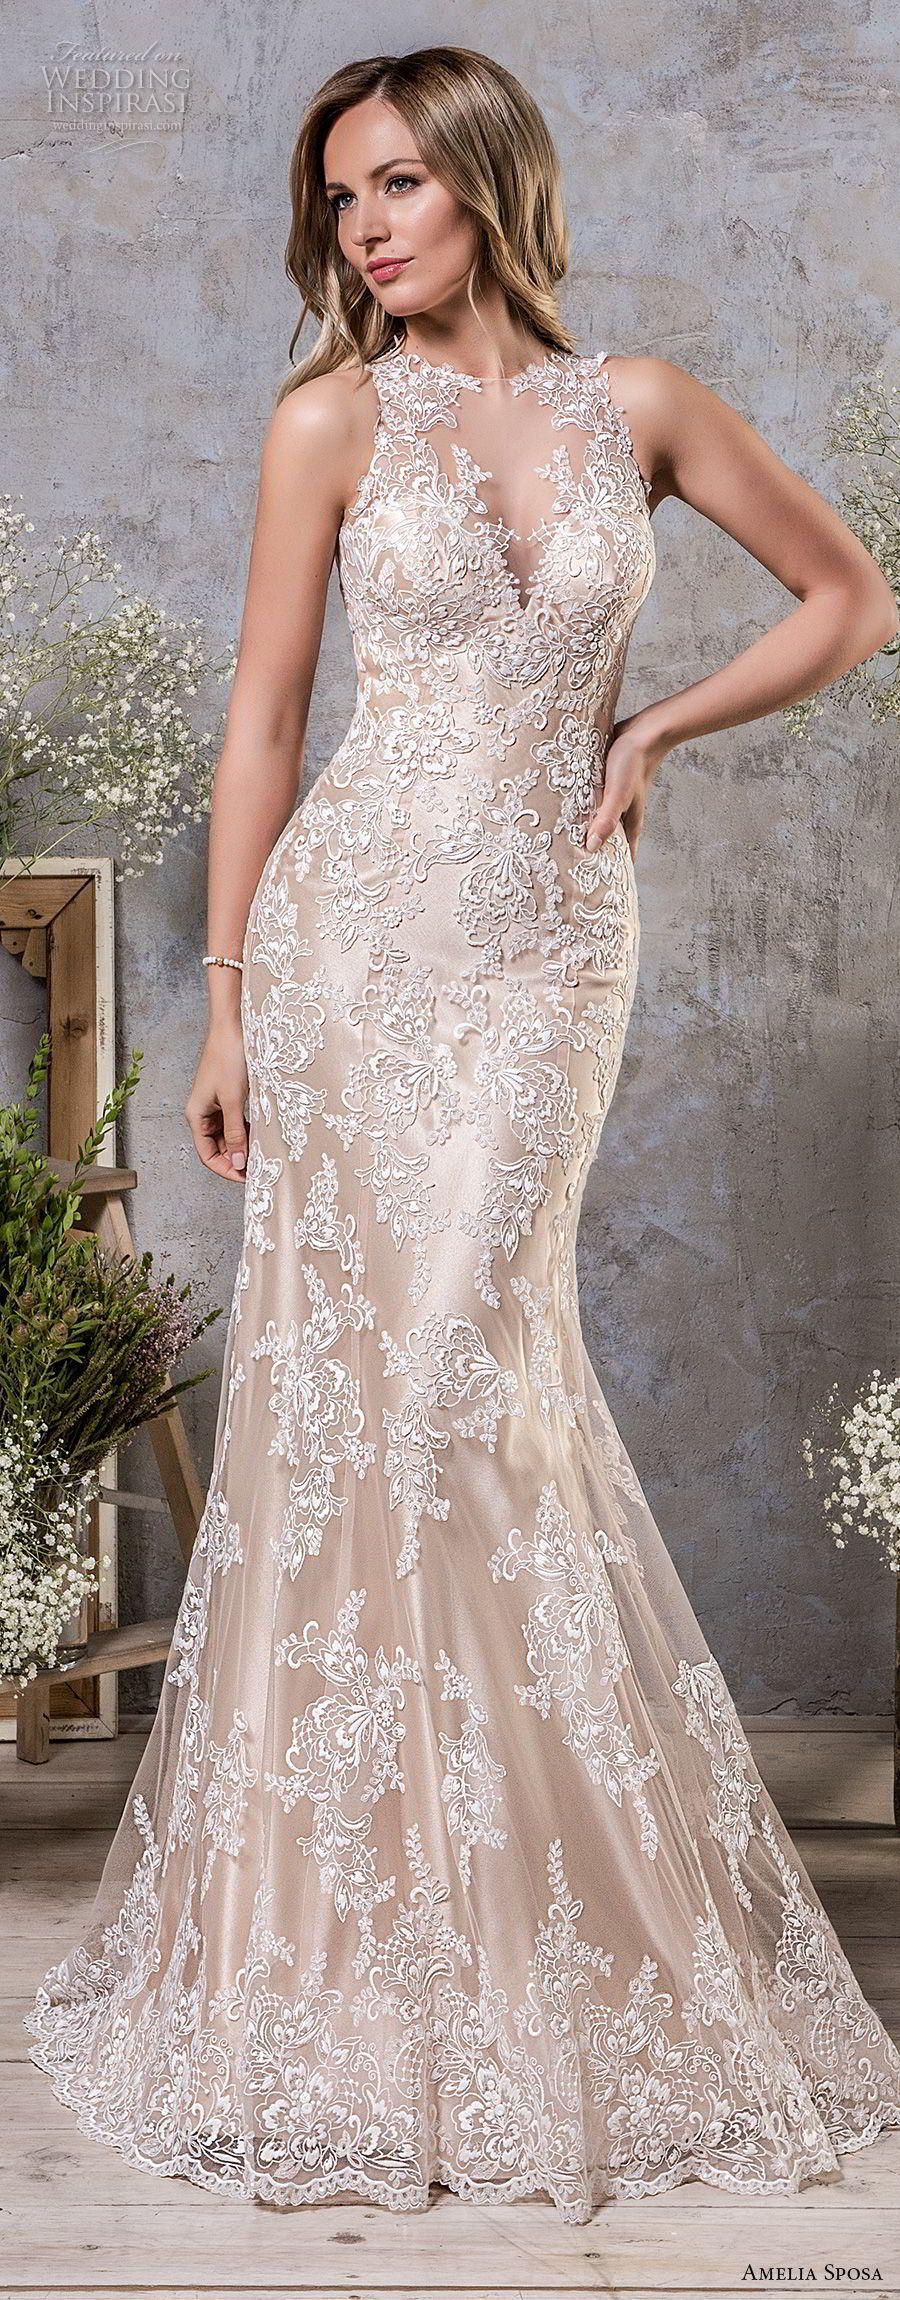 Amelia Sposa Fall 2018 Wedding Dresses | Pinterest | Amelia sposa ...